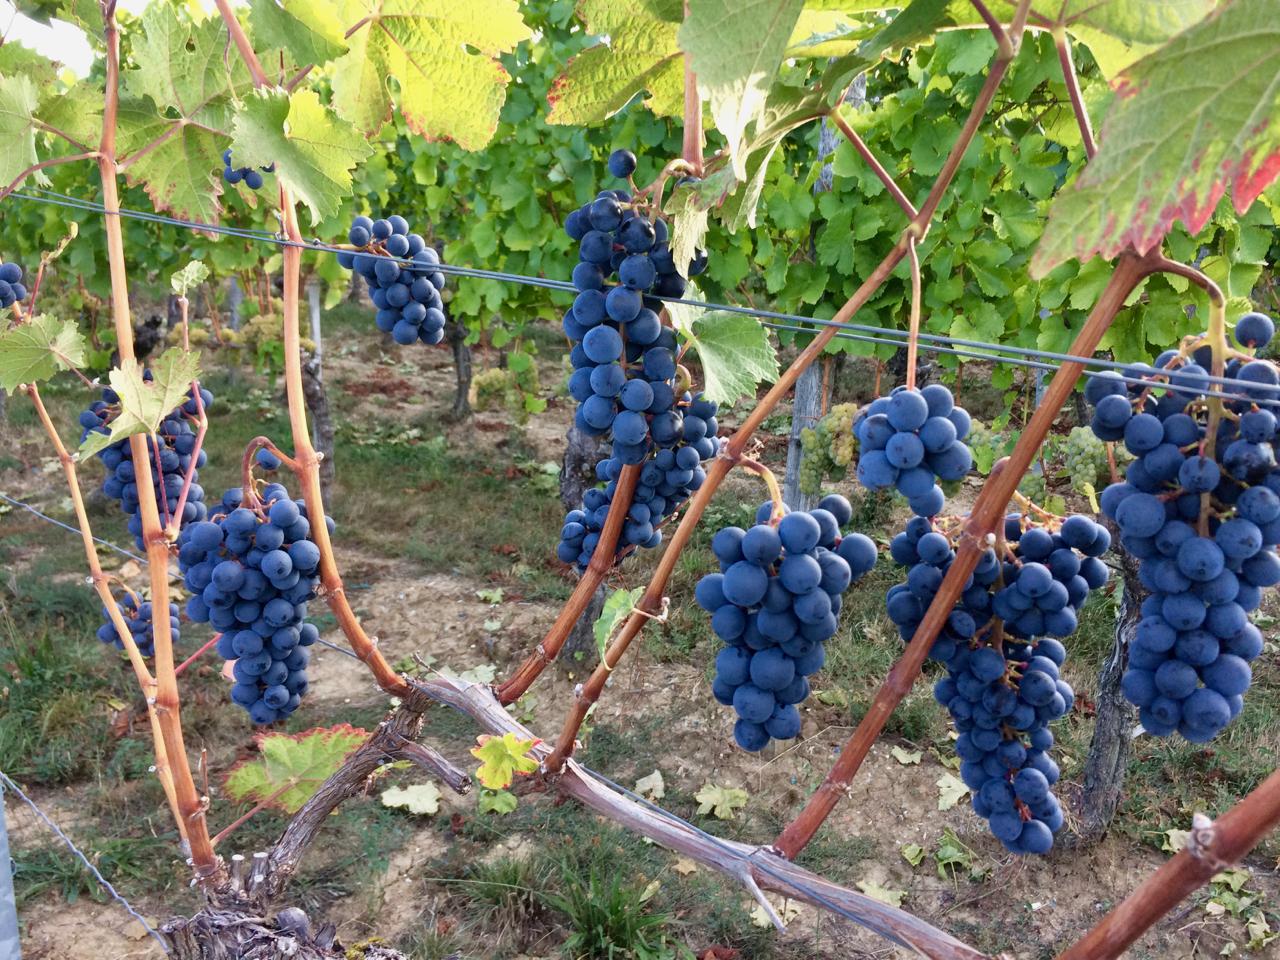 Рукав винограда с урожаем